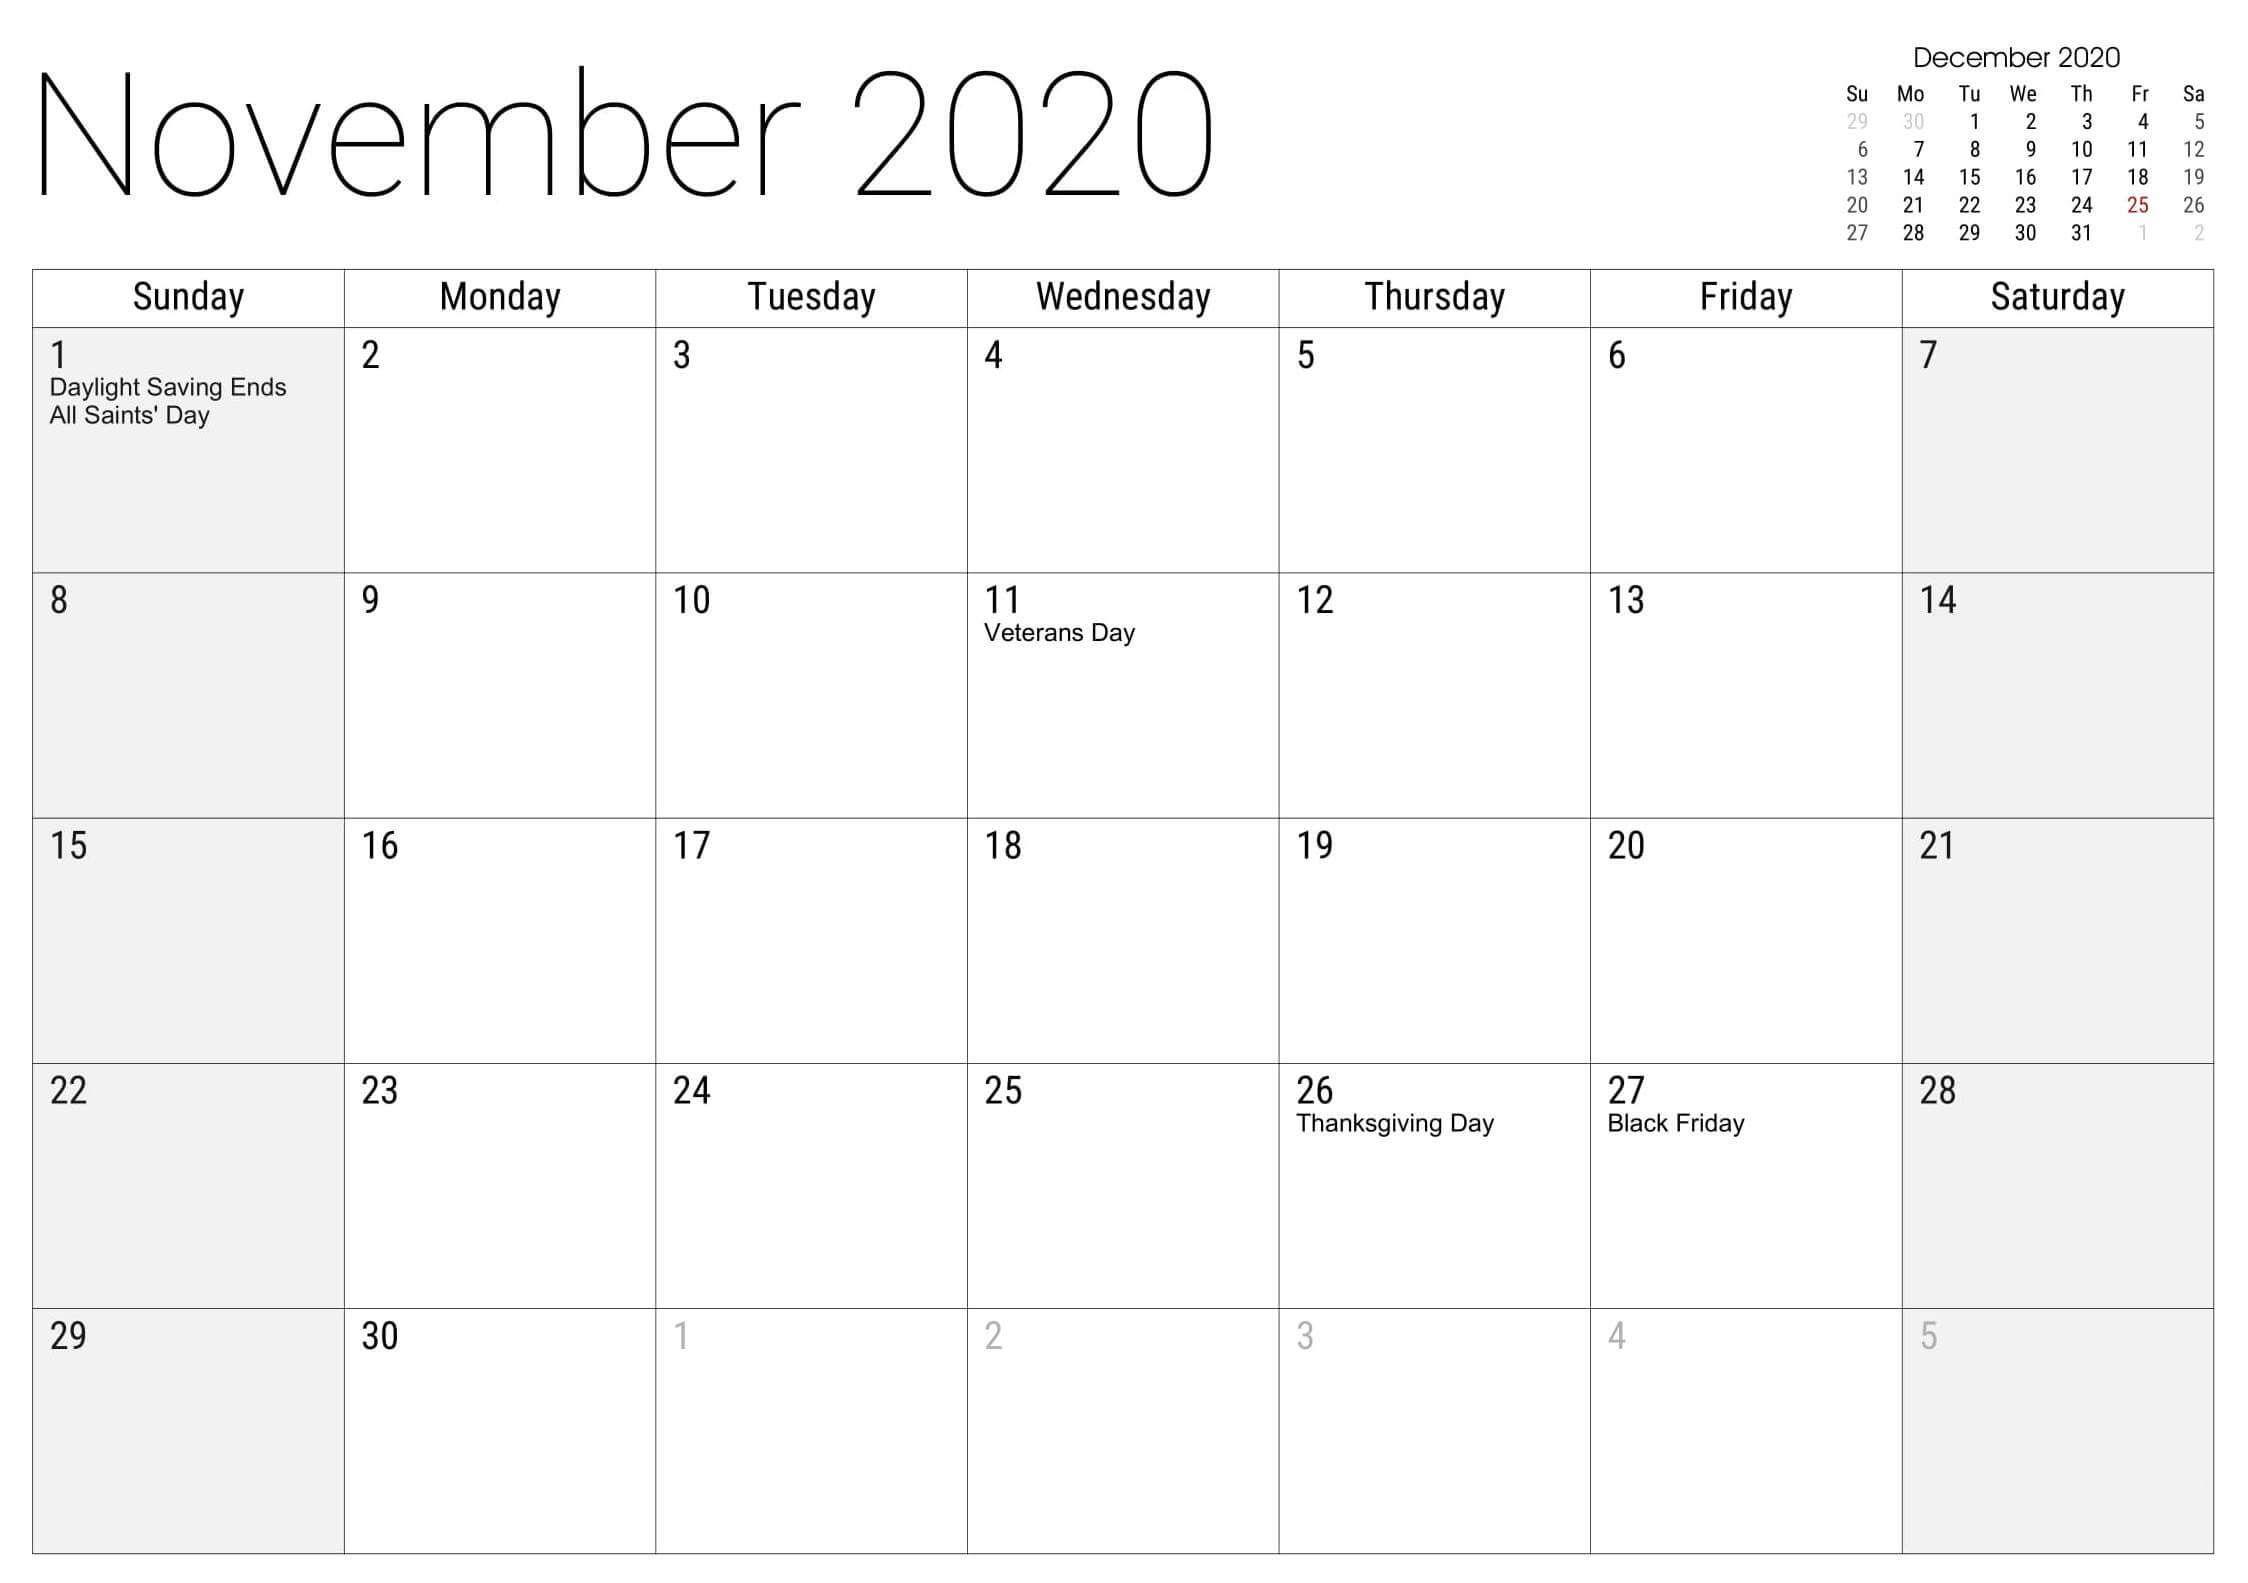 November 2020 Australia Holidays Calendar Holiday Calendar Australia Holidays November Holidays